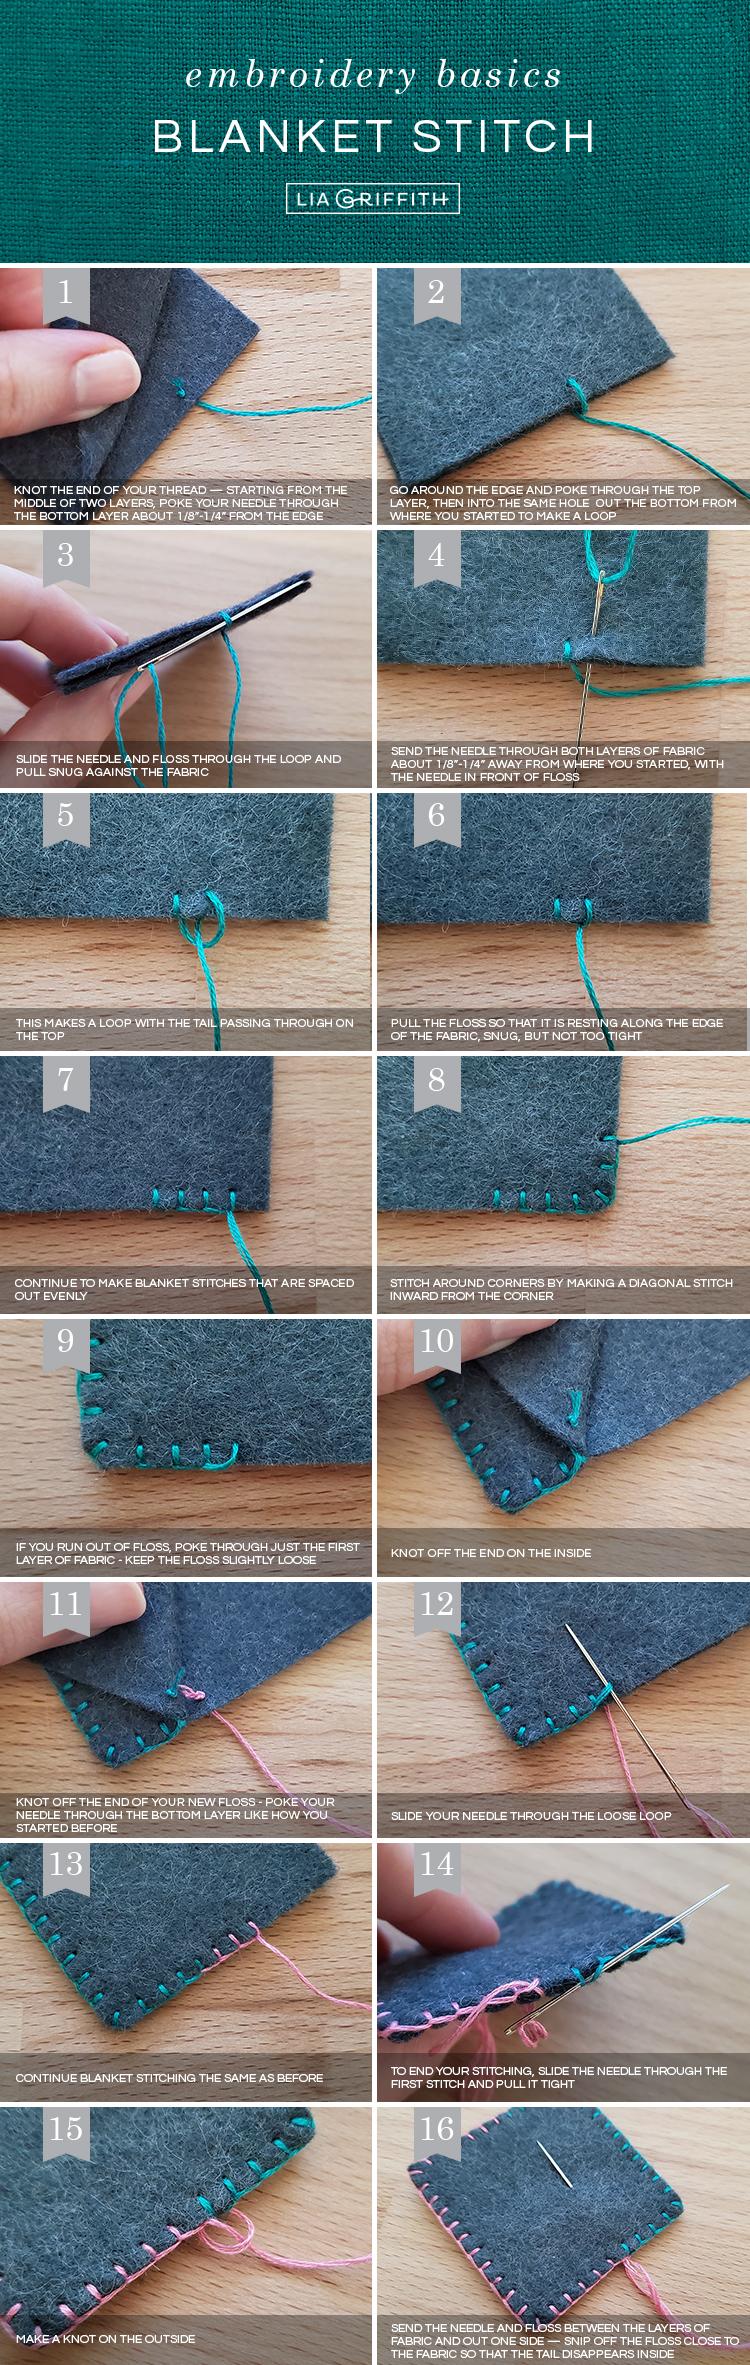 basic embroidery stitches: blanket stitch tutorial